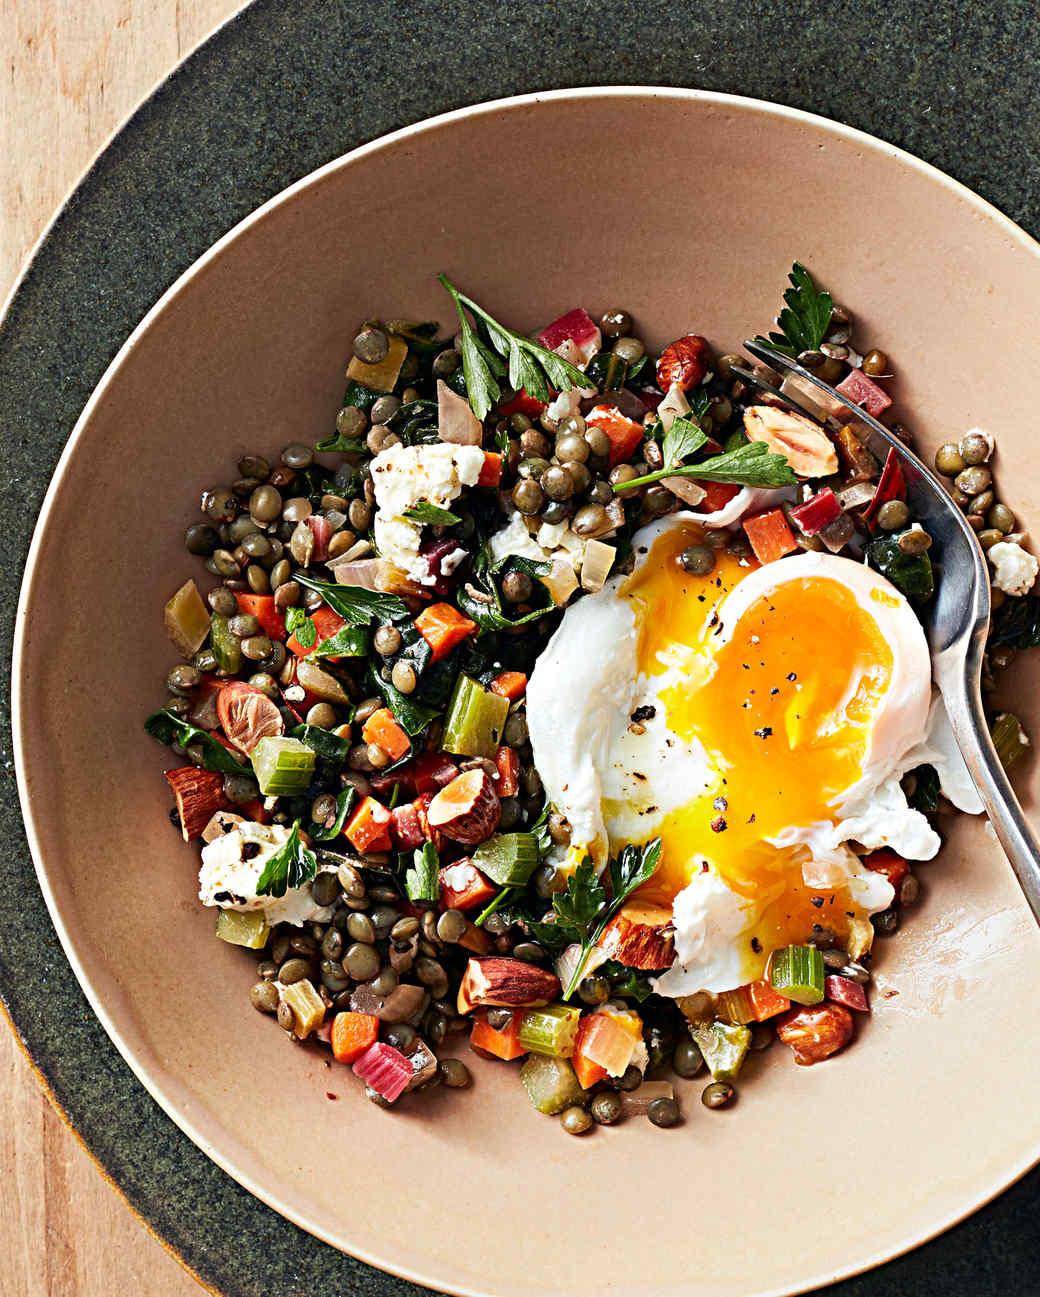 humble beginnings warm lentil salad eggs